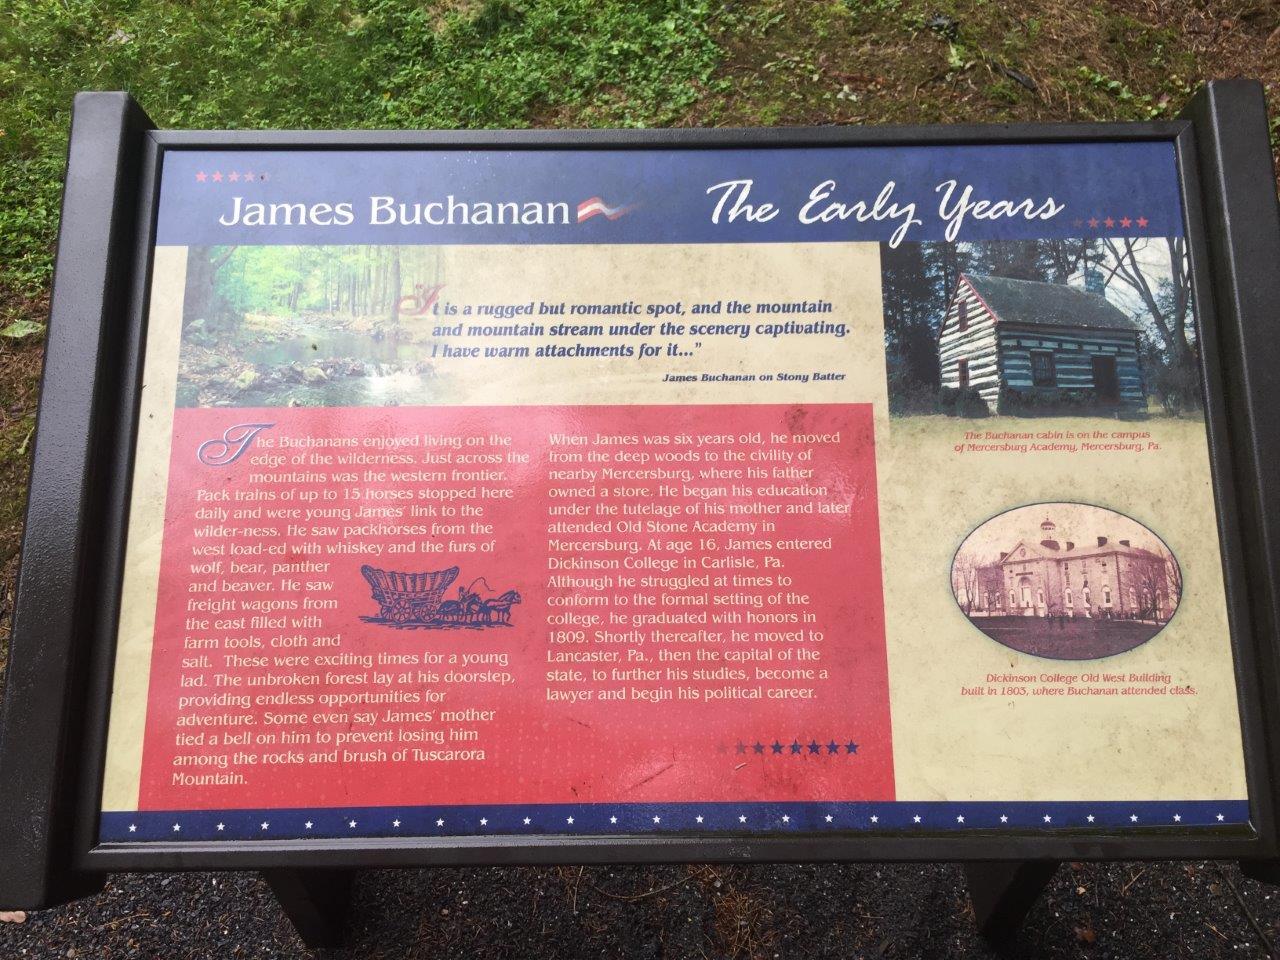 photo of James Buchanan's birthplace marker